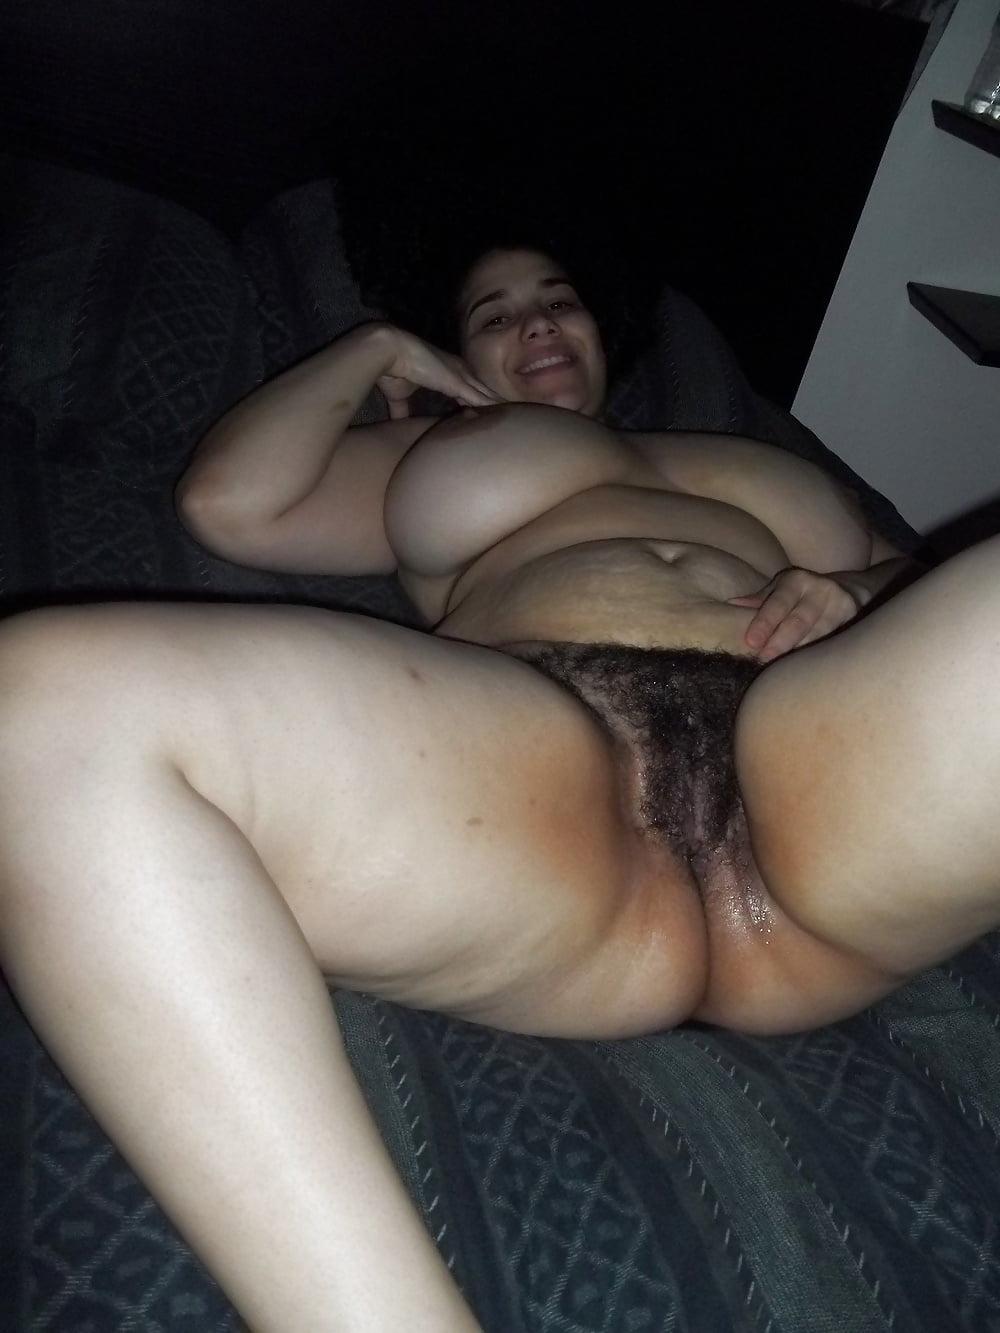 Hermosa gordibuena de cali masturbandose por webcam - 3 part 2